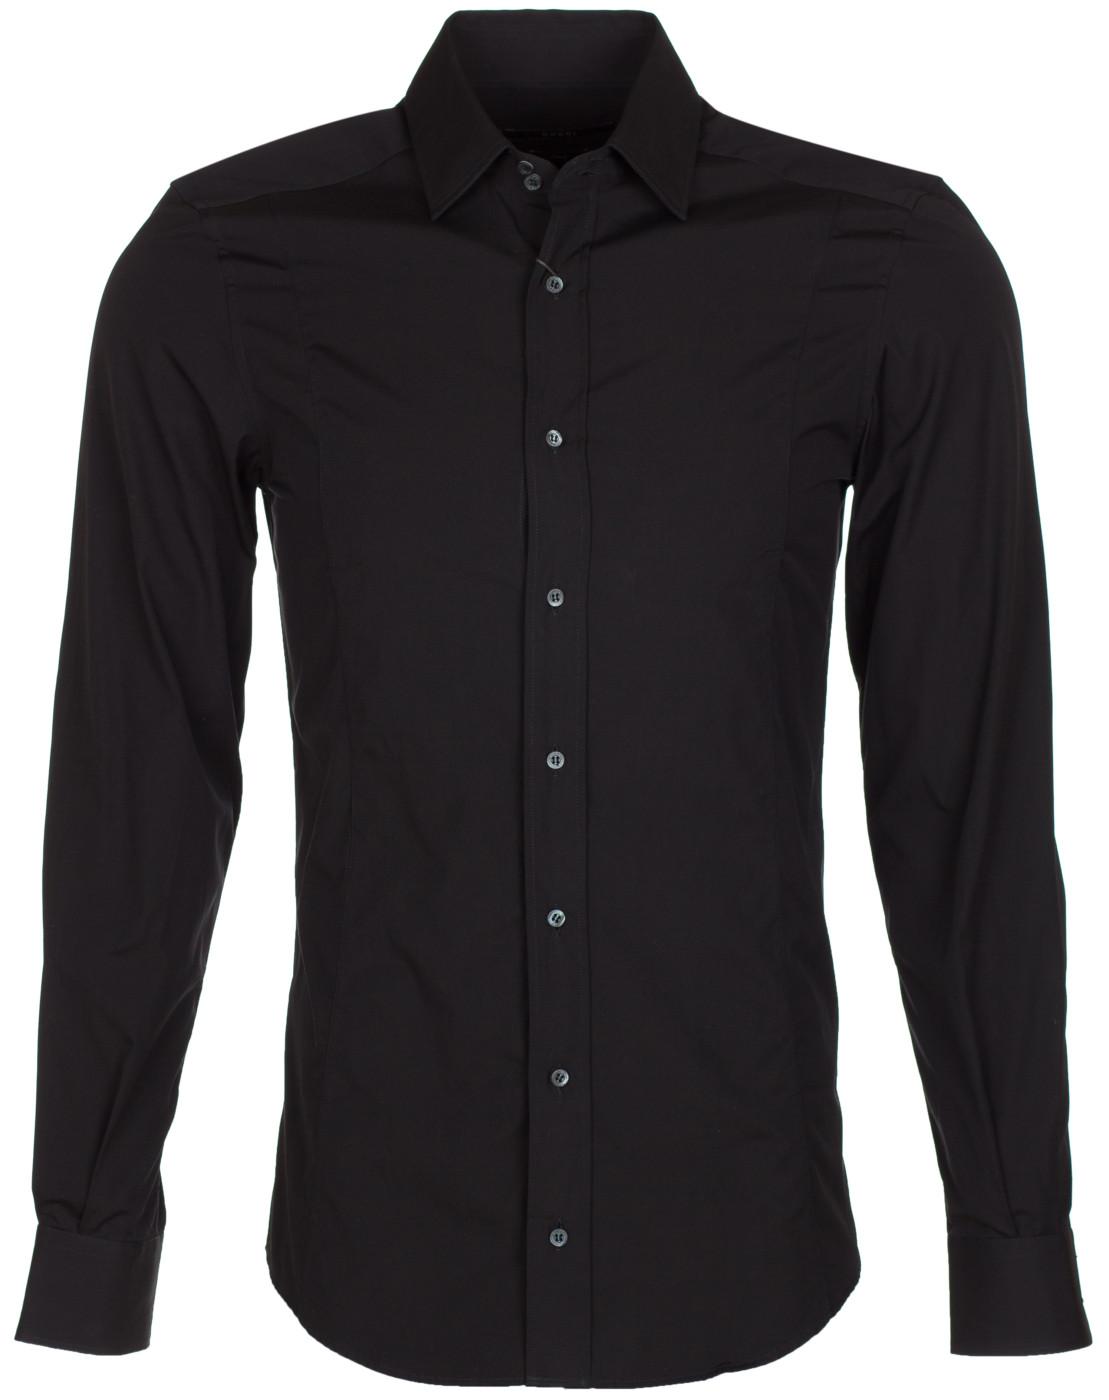 b8db6bd2f43 Gucci Men's Black Cotton Fitted Button Down Dress Shirt